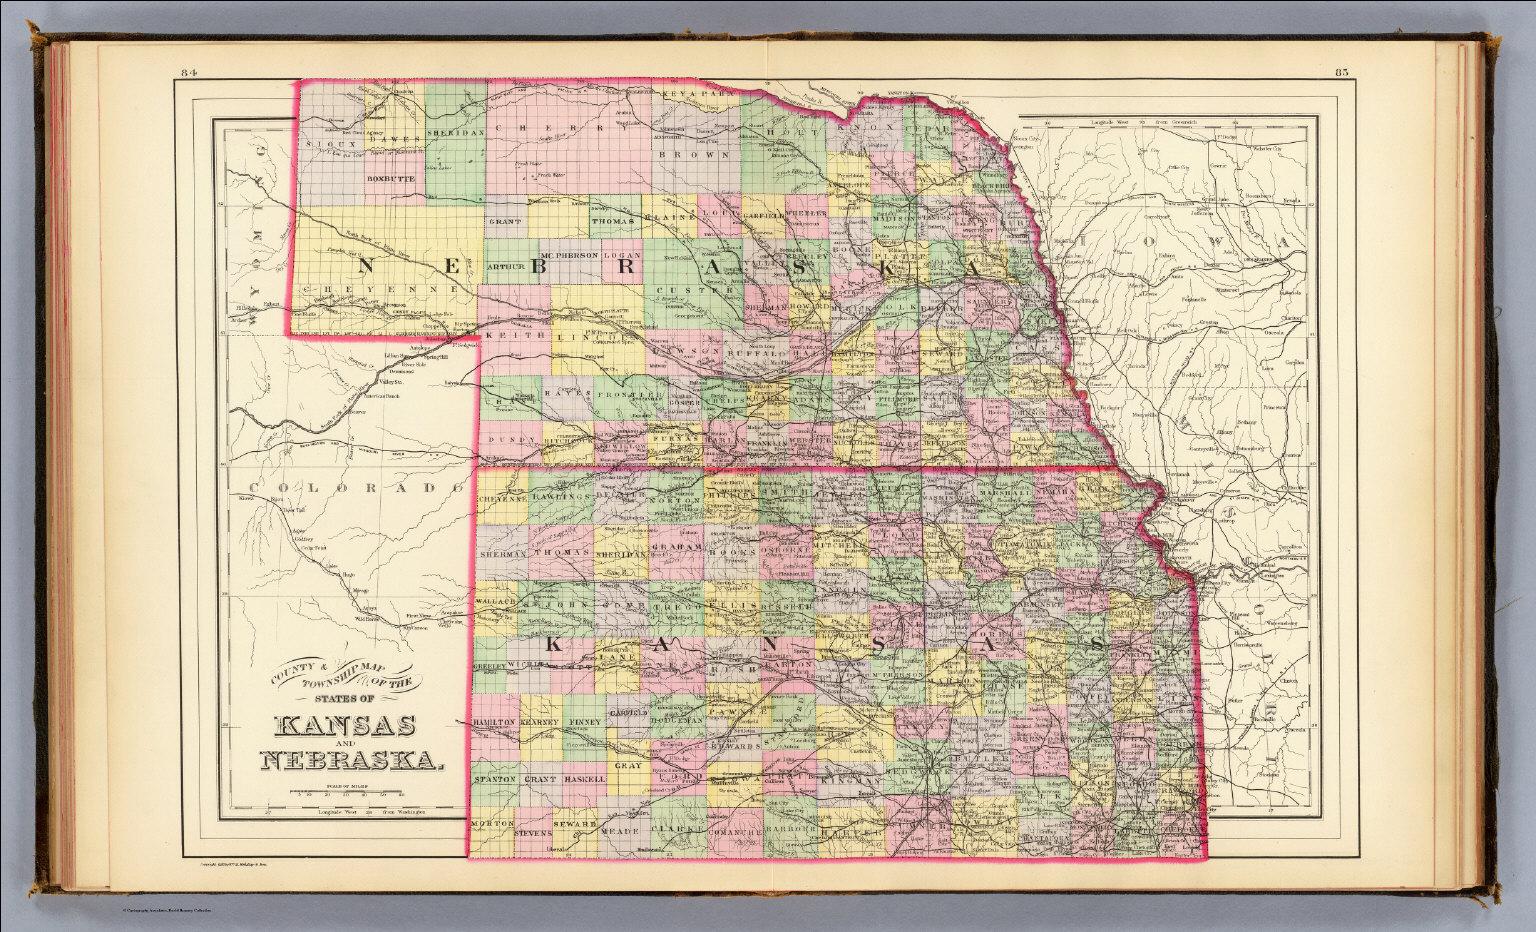 Kansas, Nebraska. / (Mitchell, Samuel Augustus) / 1890